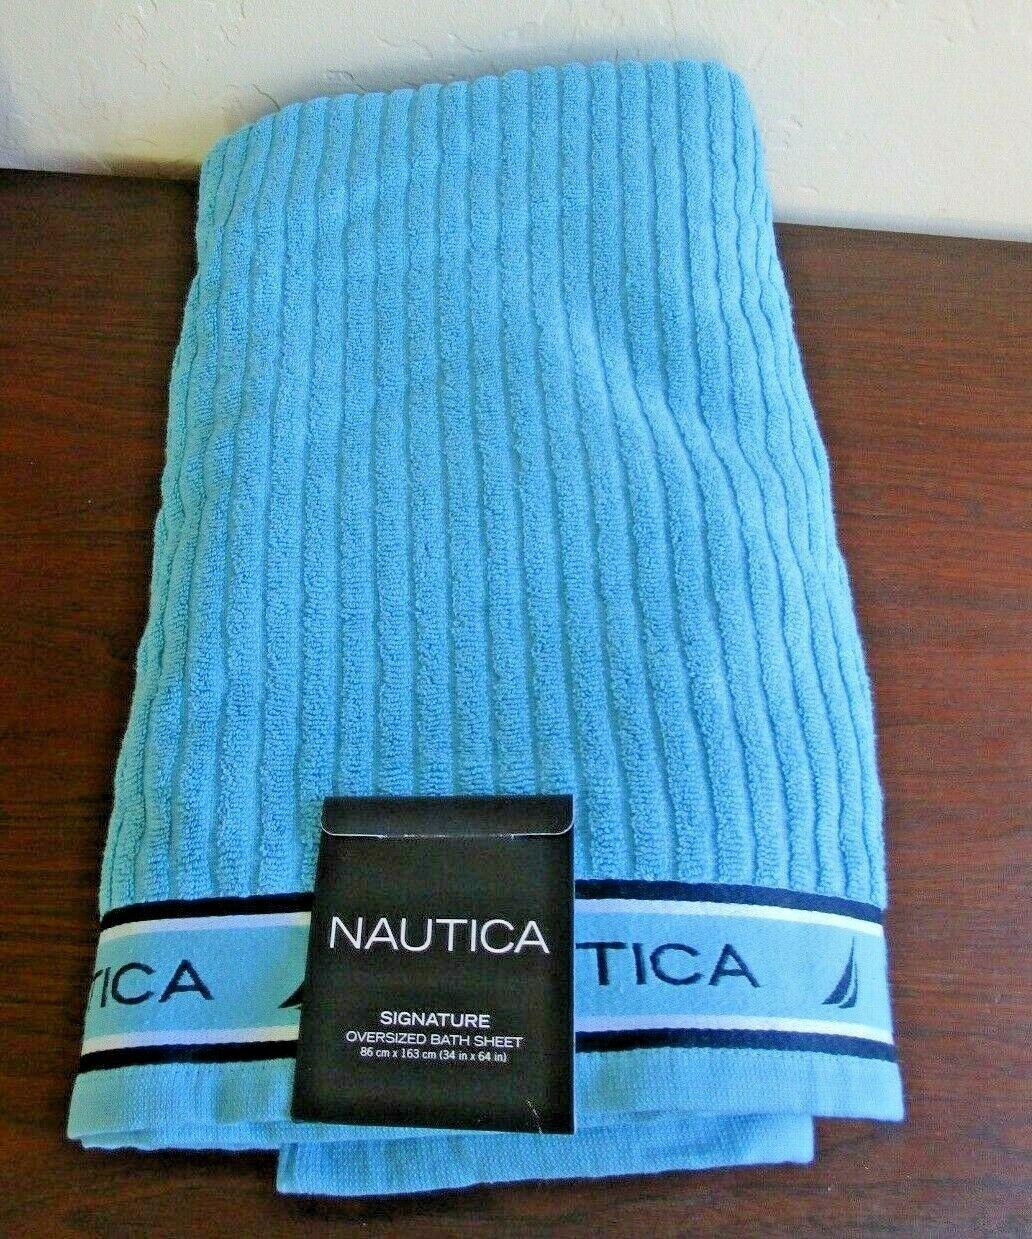 Nautica Signature 100% Cotton Oversized Bath Sheet Towel - Light Blue, 34x64 NEW